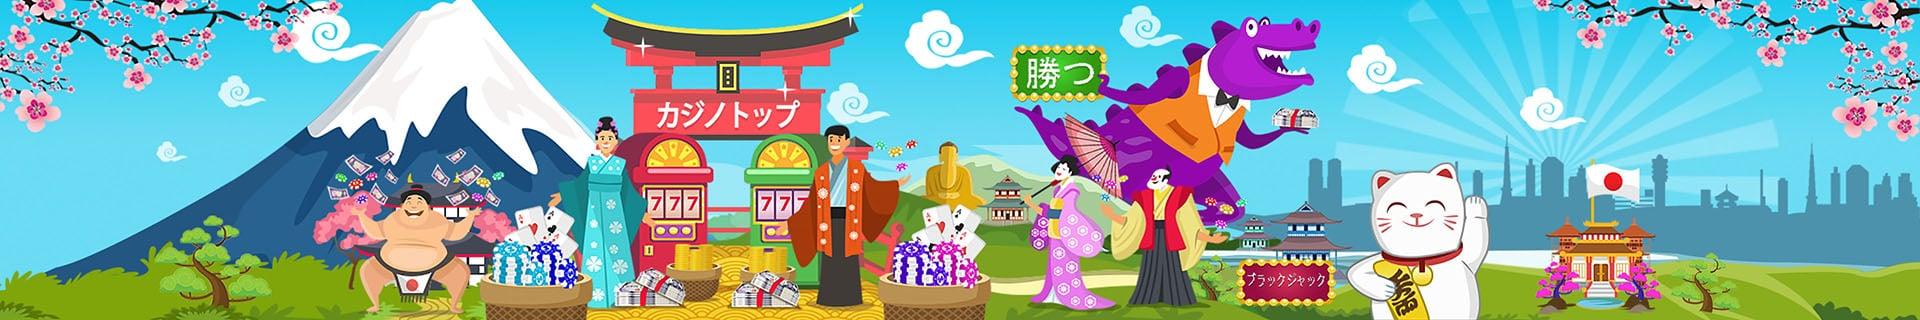 CasinoTop Japan Banner